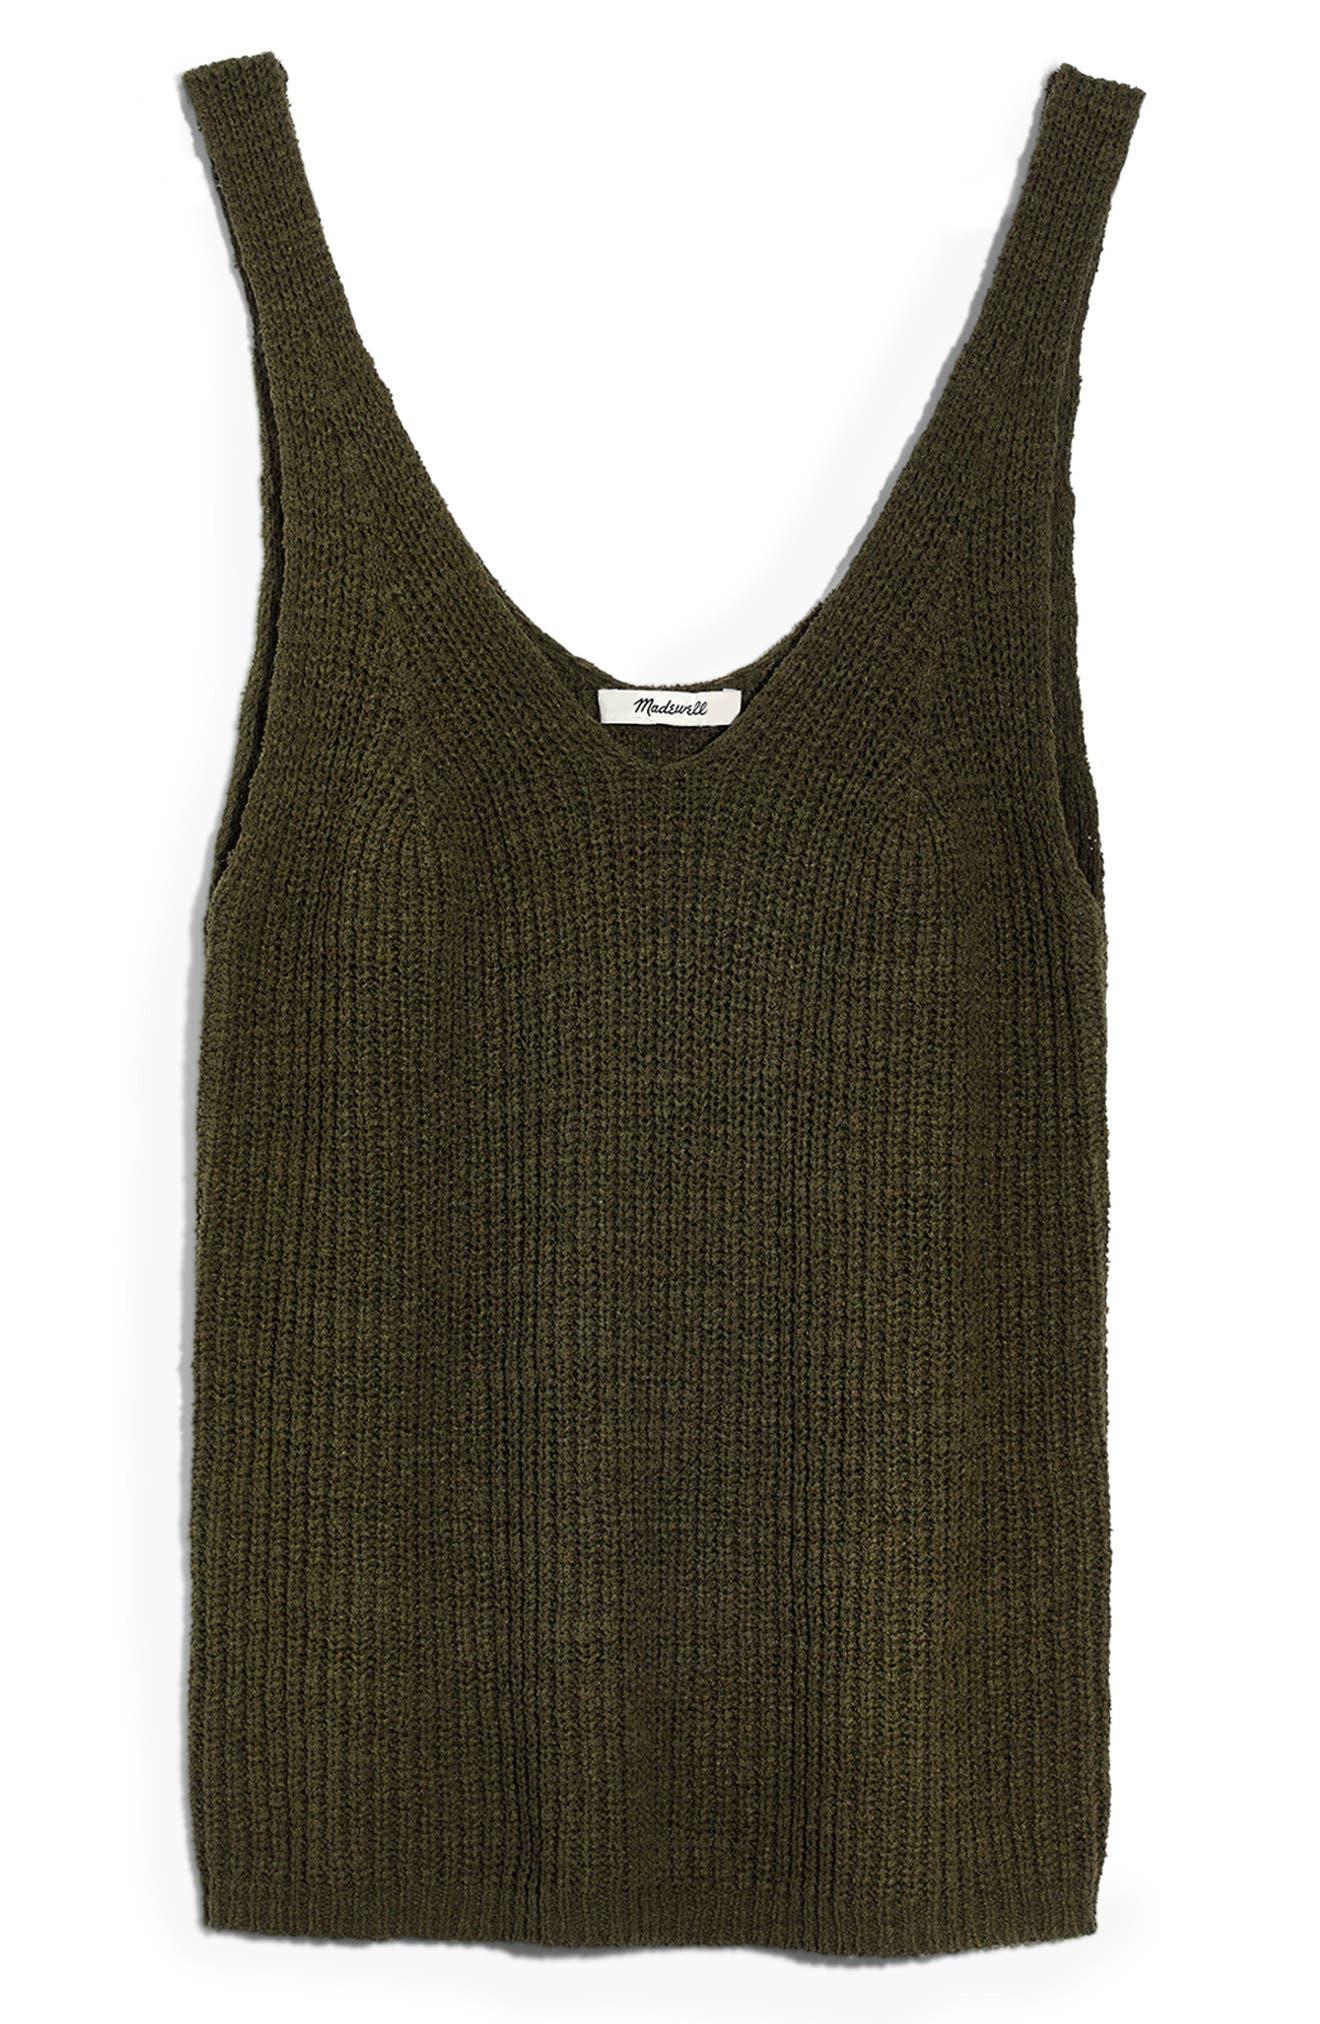 MADEWELL, Monterey Sweater Tank, Alternate thumbnail 3, color, DARK OLIVE